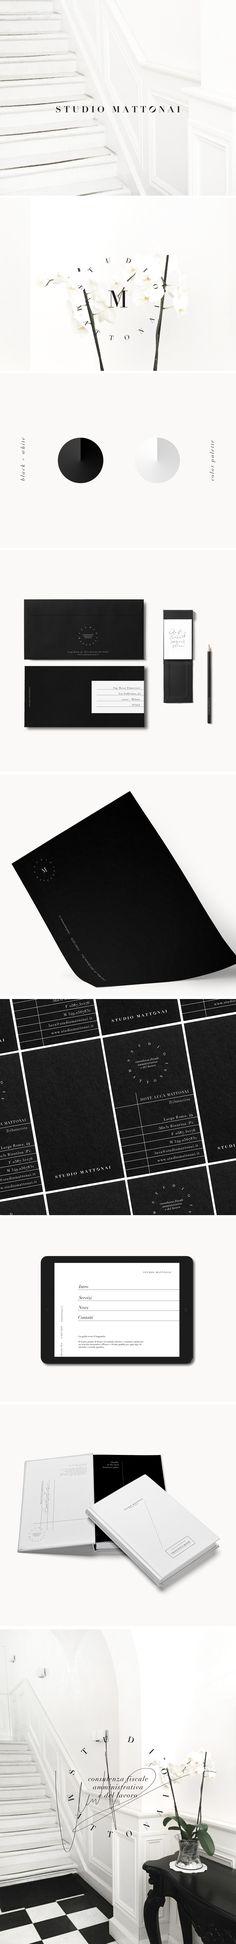 Brand Identity: Studio Mattonai — ESSE CREATIVE #brandidentity #branding #design